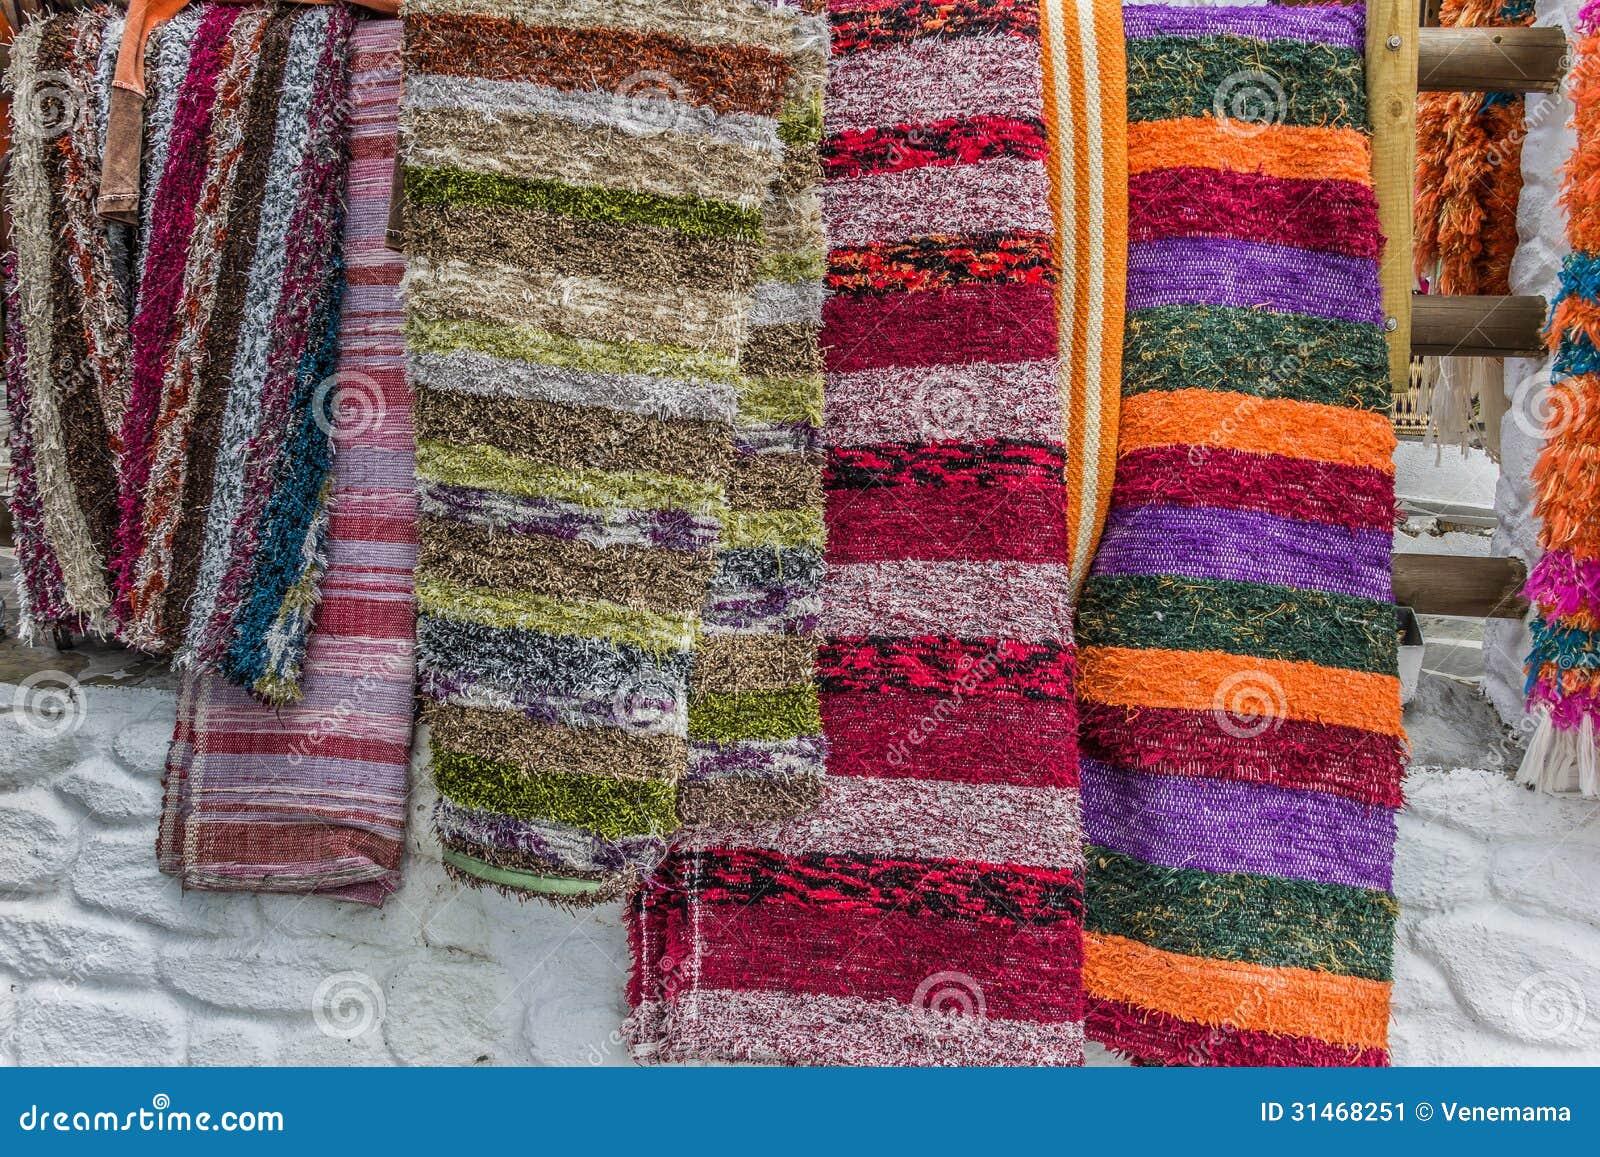 Handmade Rugs Of Las Alpujarras Stock Image